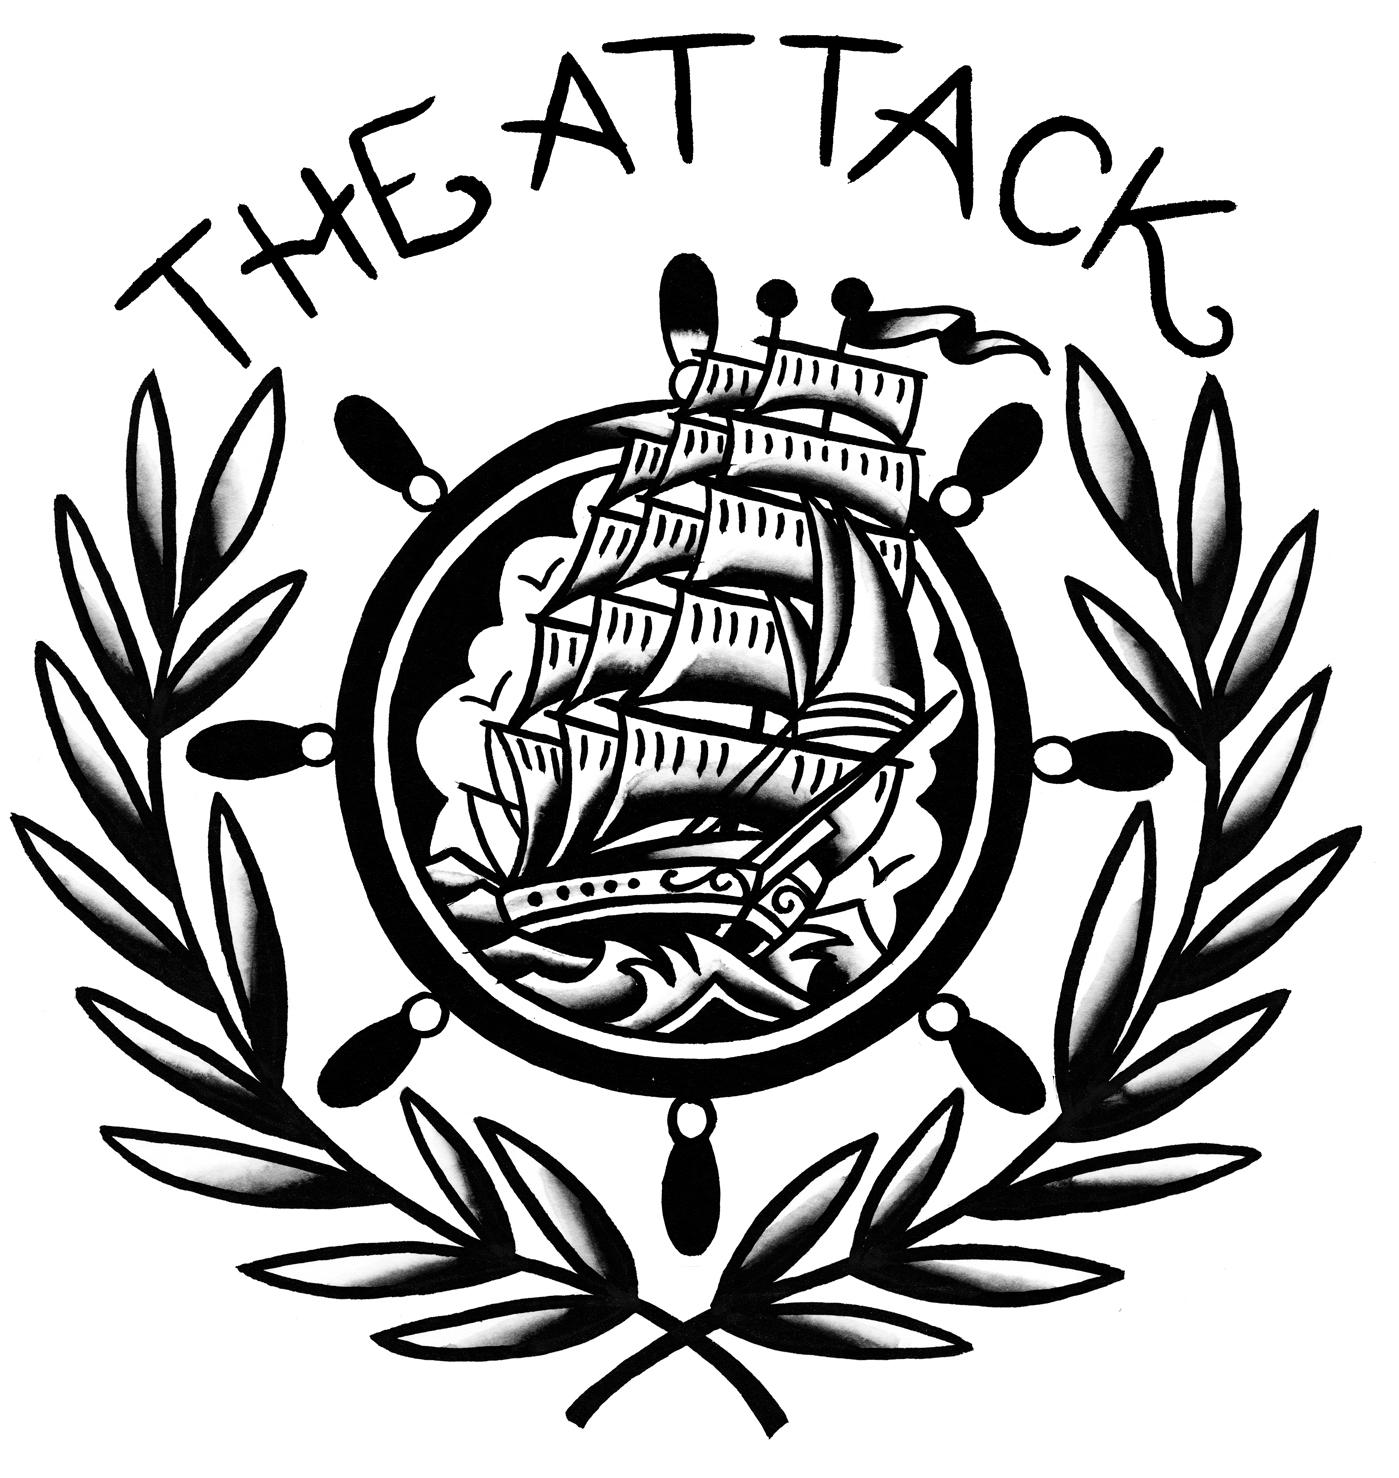 The Attack cut anchor_Ship_black